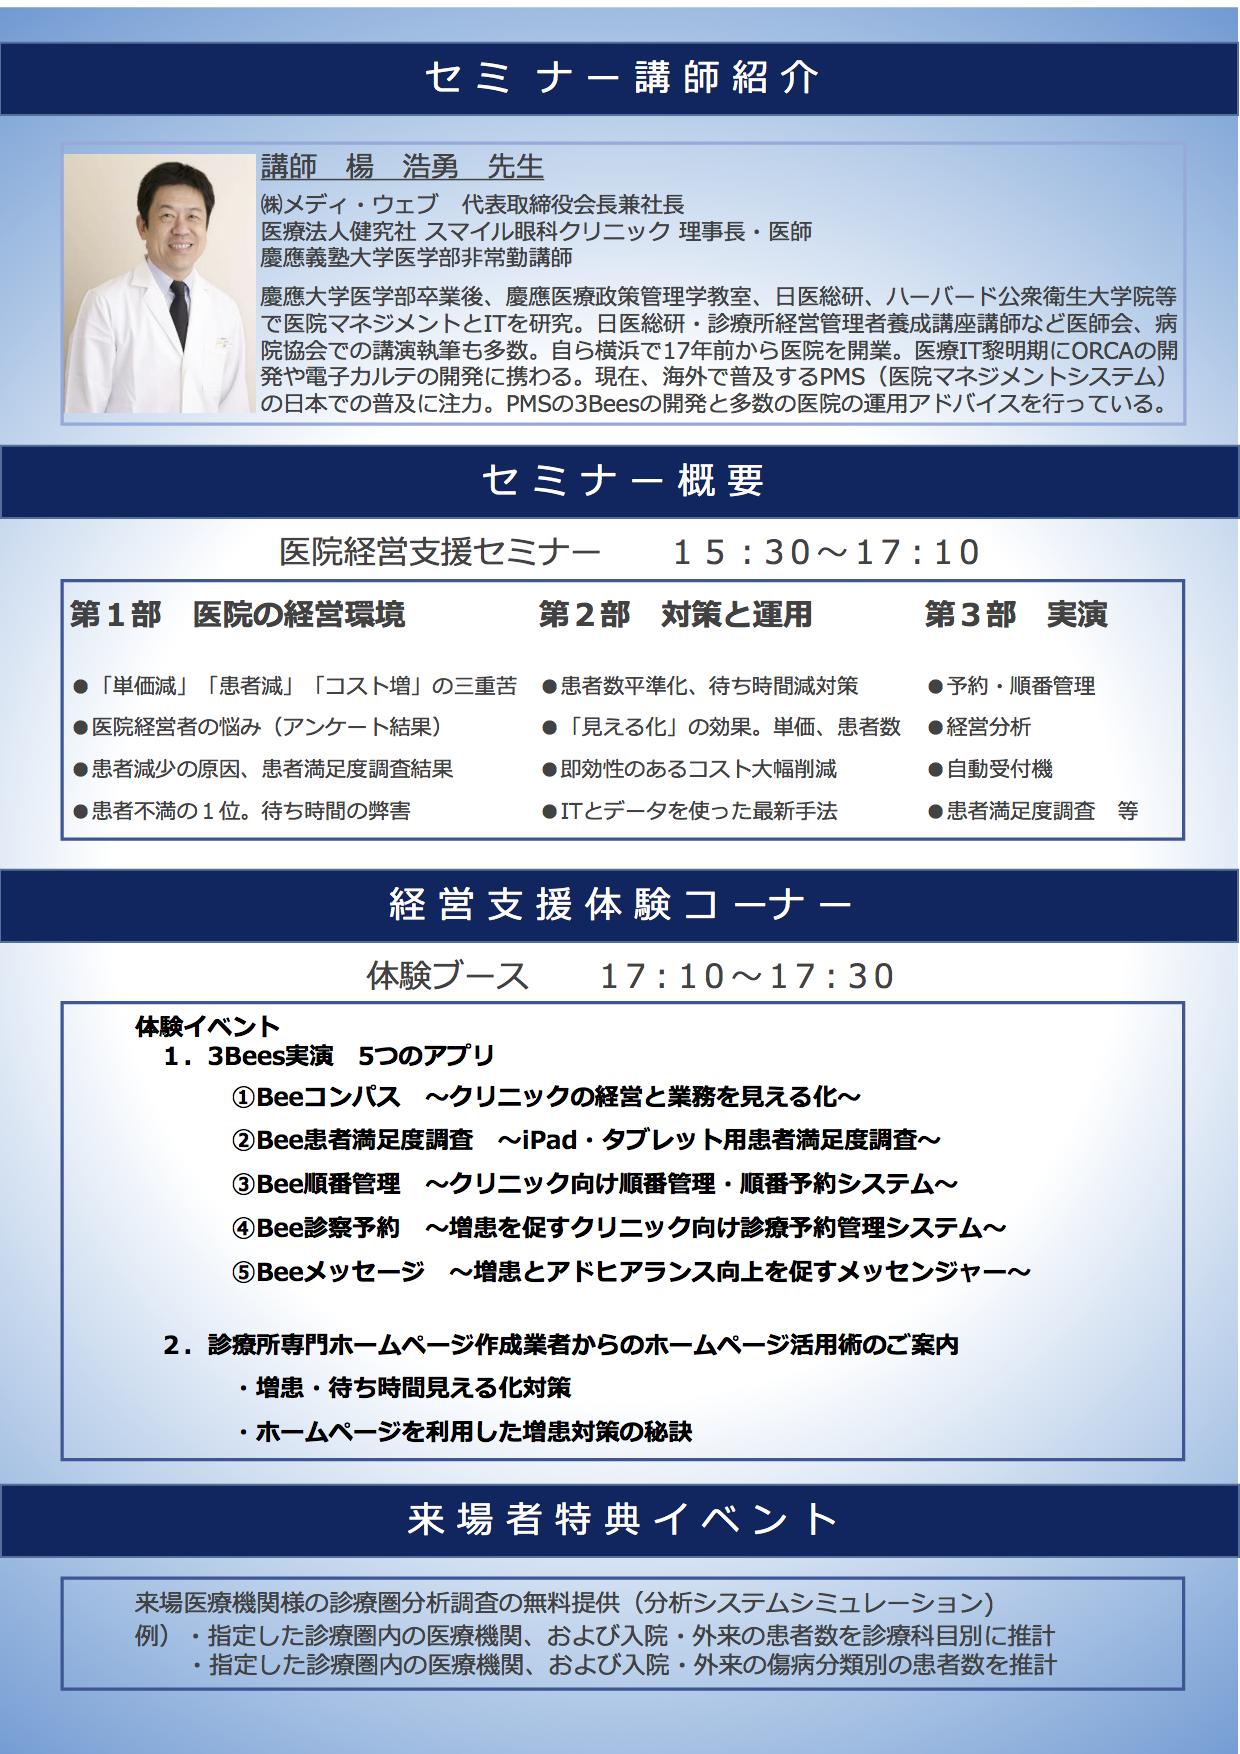 seminar_fukuoka-2